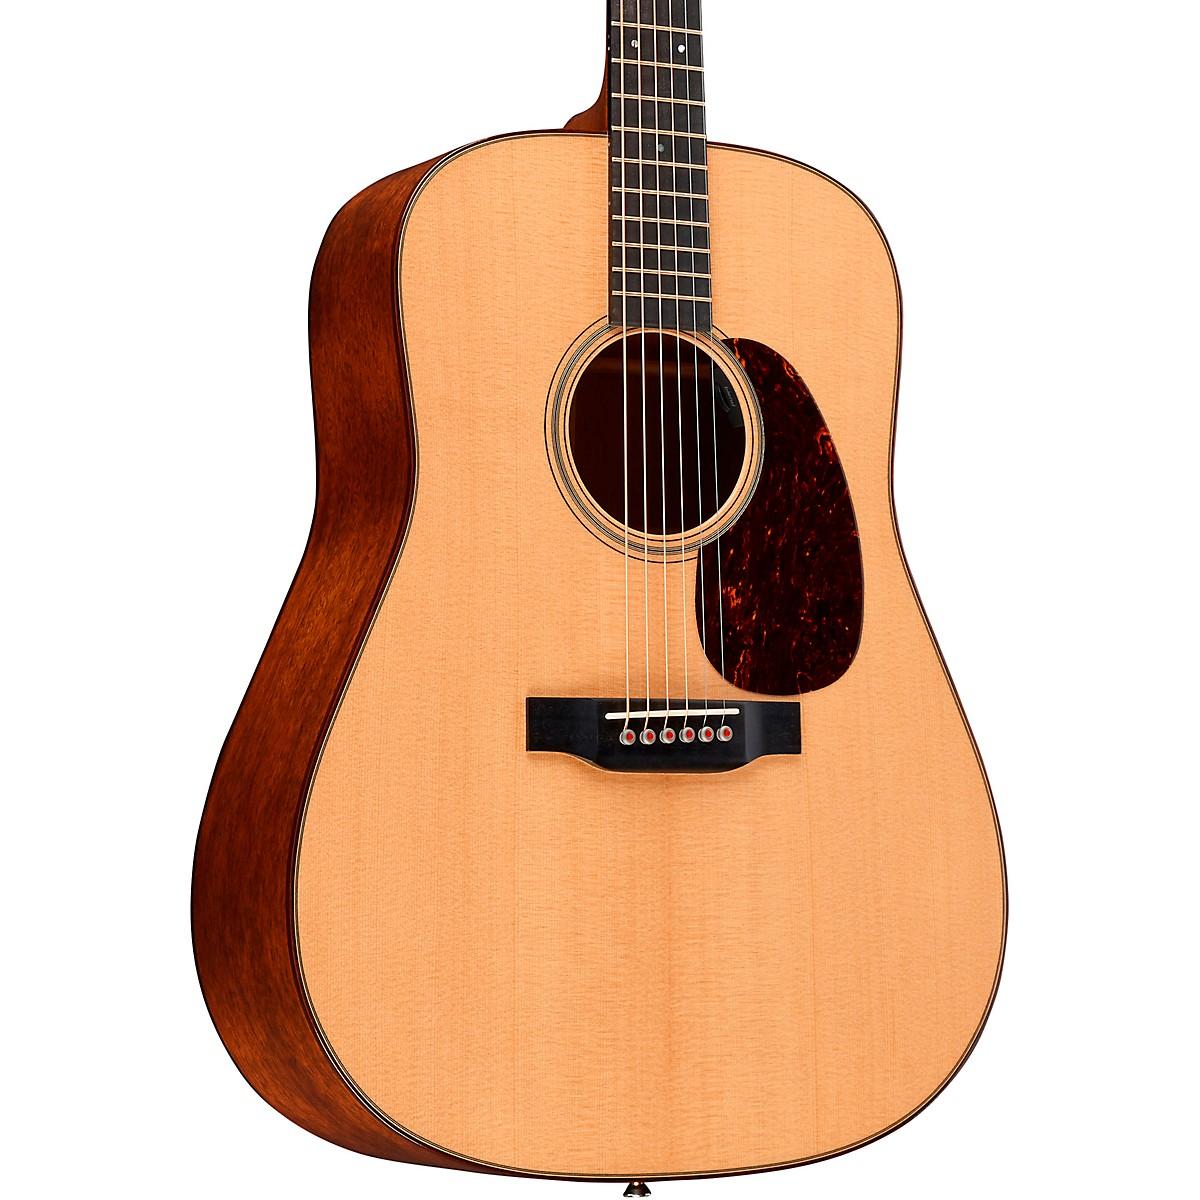 Martin D-18E Modern Deluxe Dreadnought Acoustic-Electric Guitar